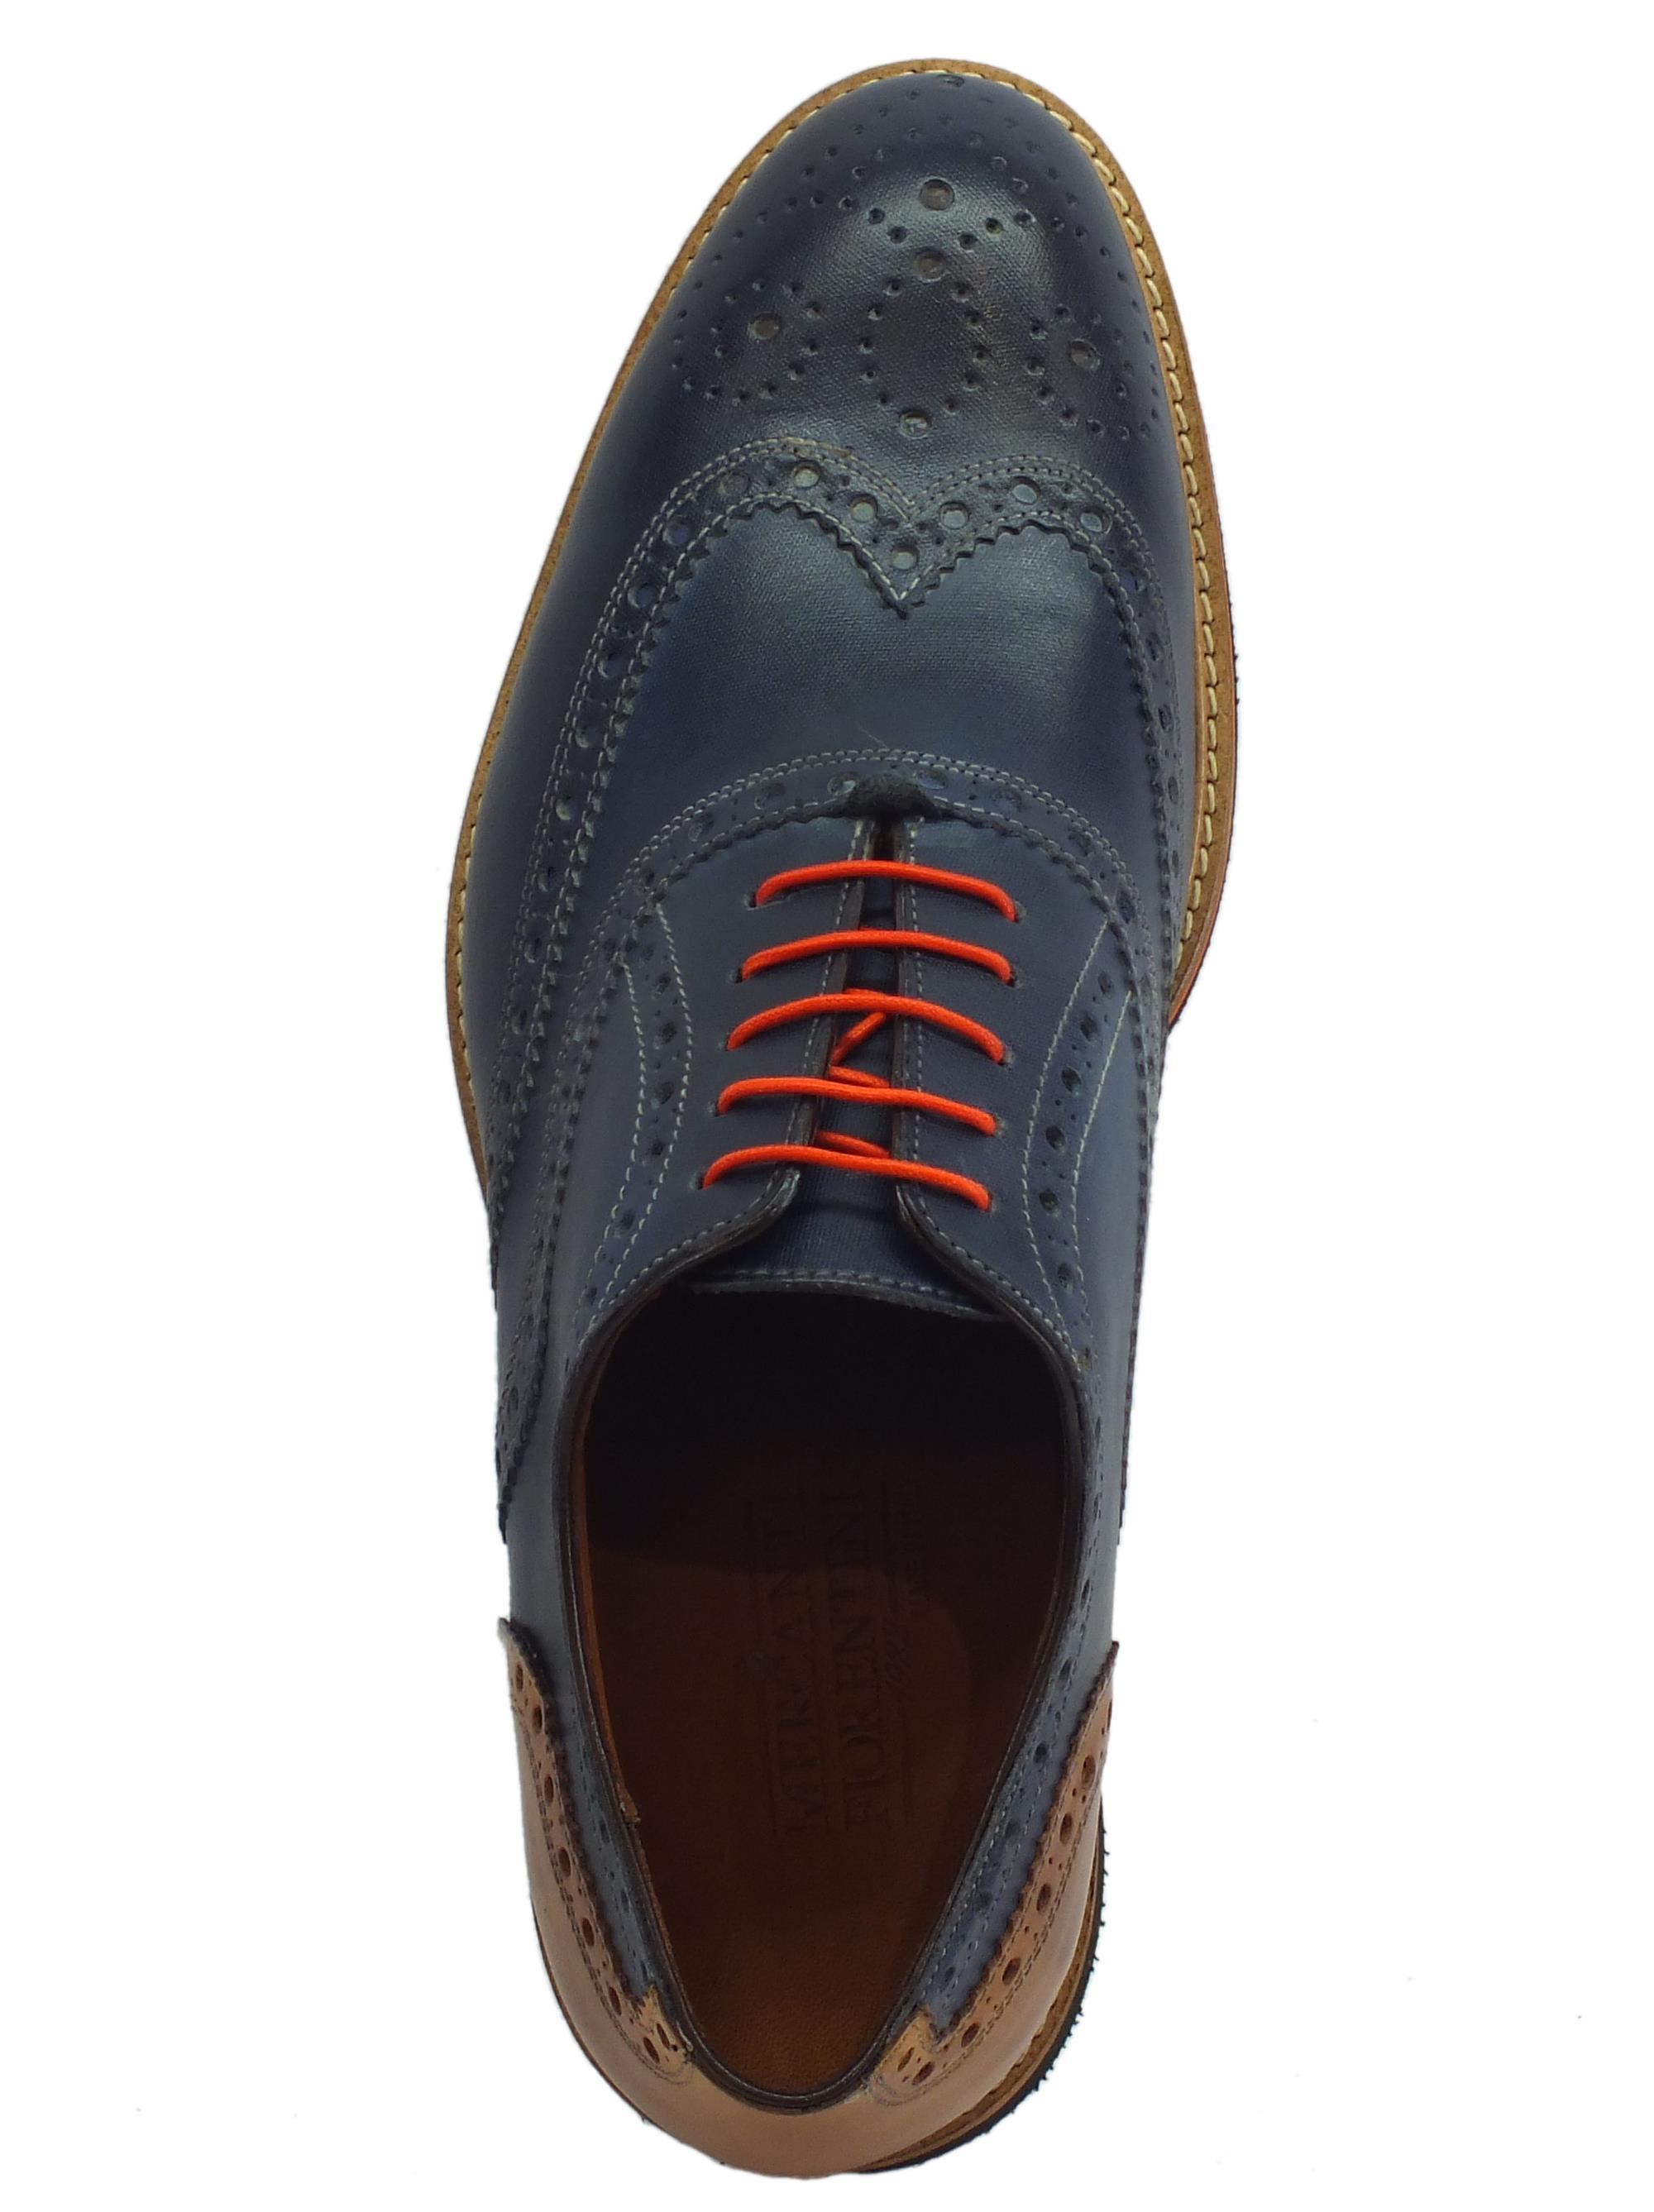 a708c2686edcc ... Scarpe eleganti per uomo Mercanti Fiorentini in pelle blu e marrone